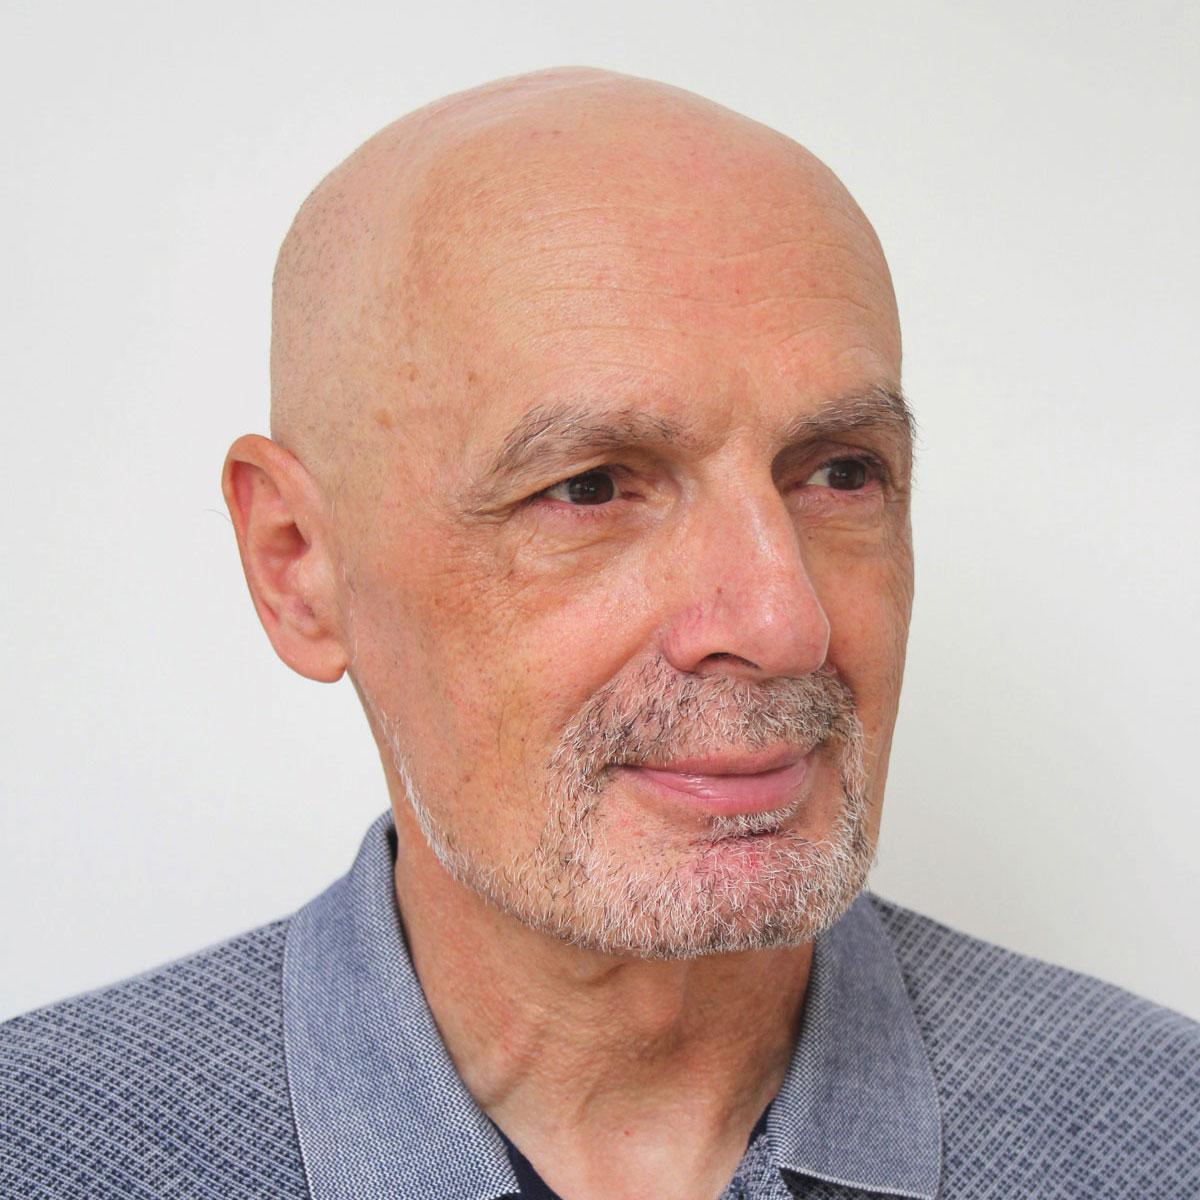 Petar Turcinovic